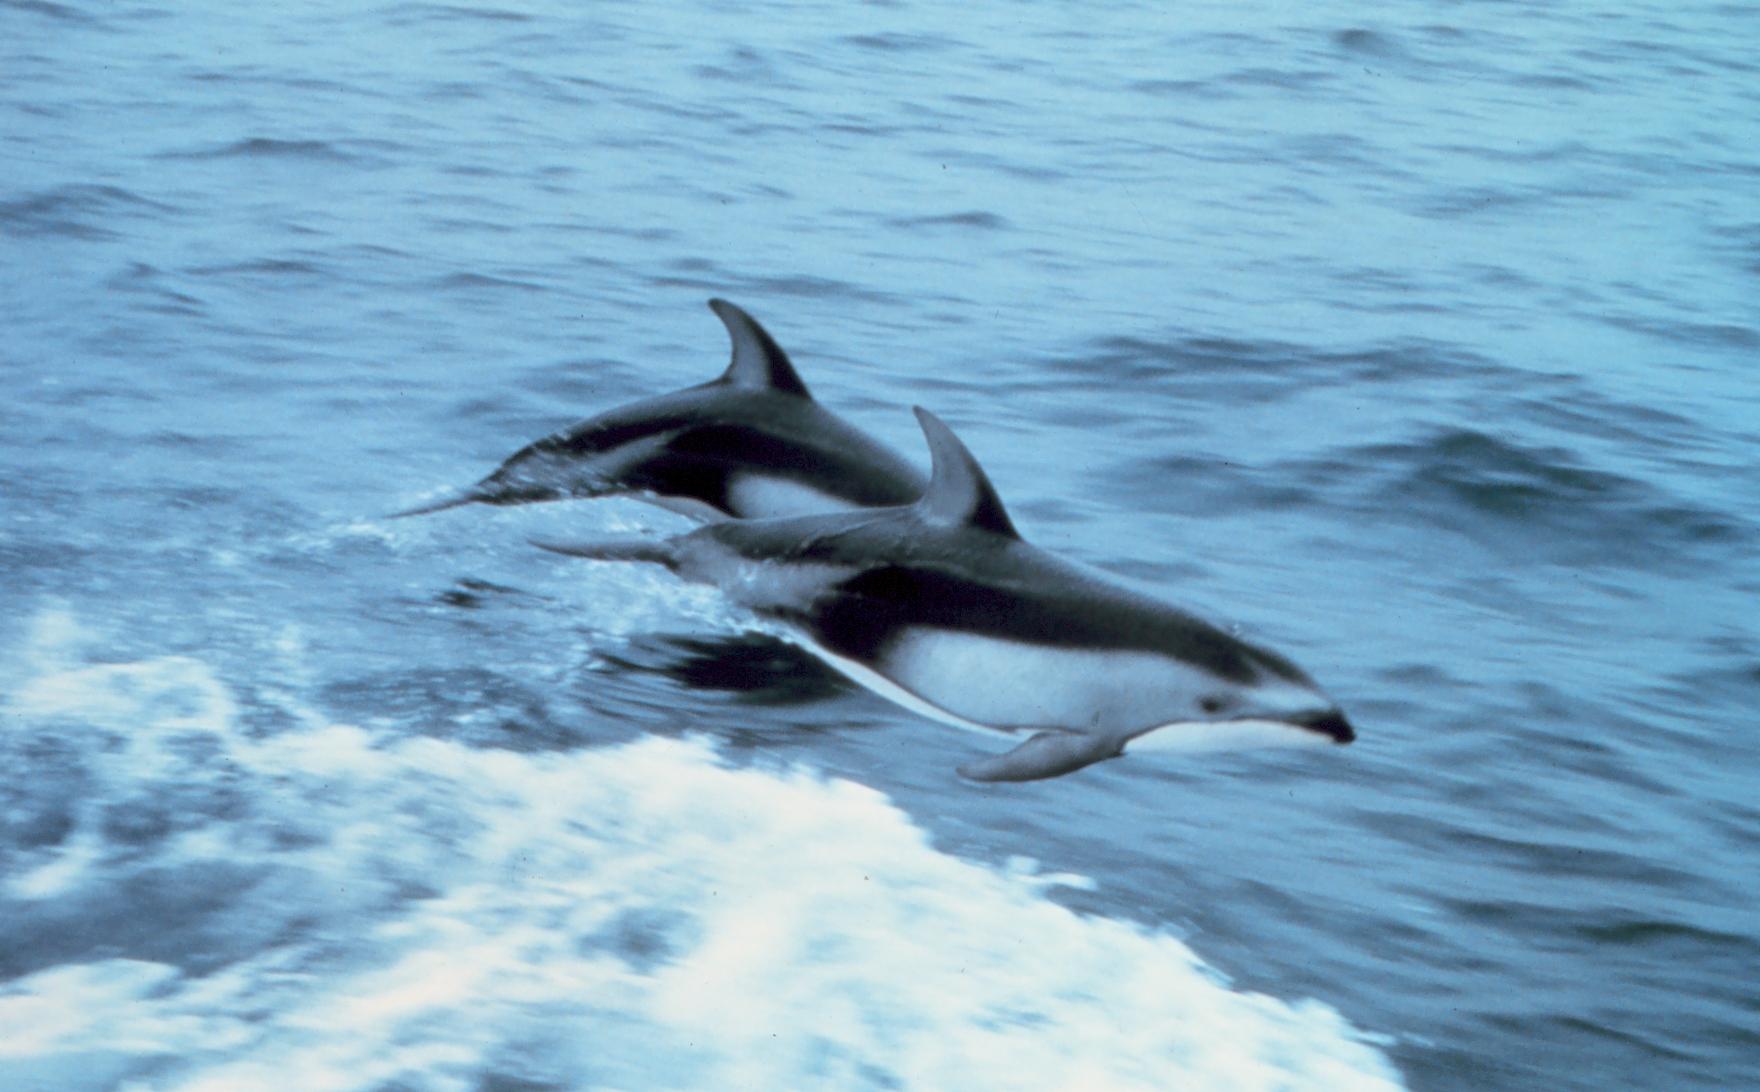 største delfin art